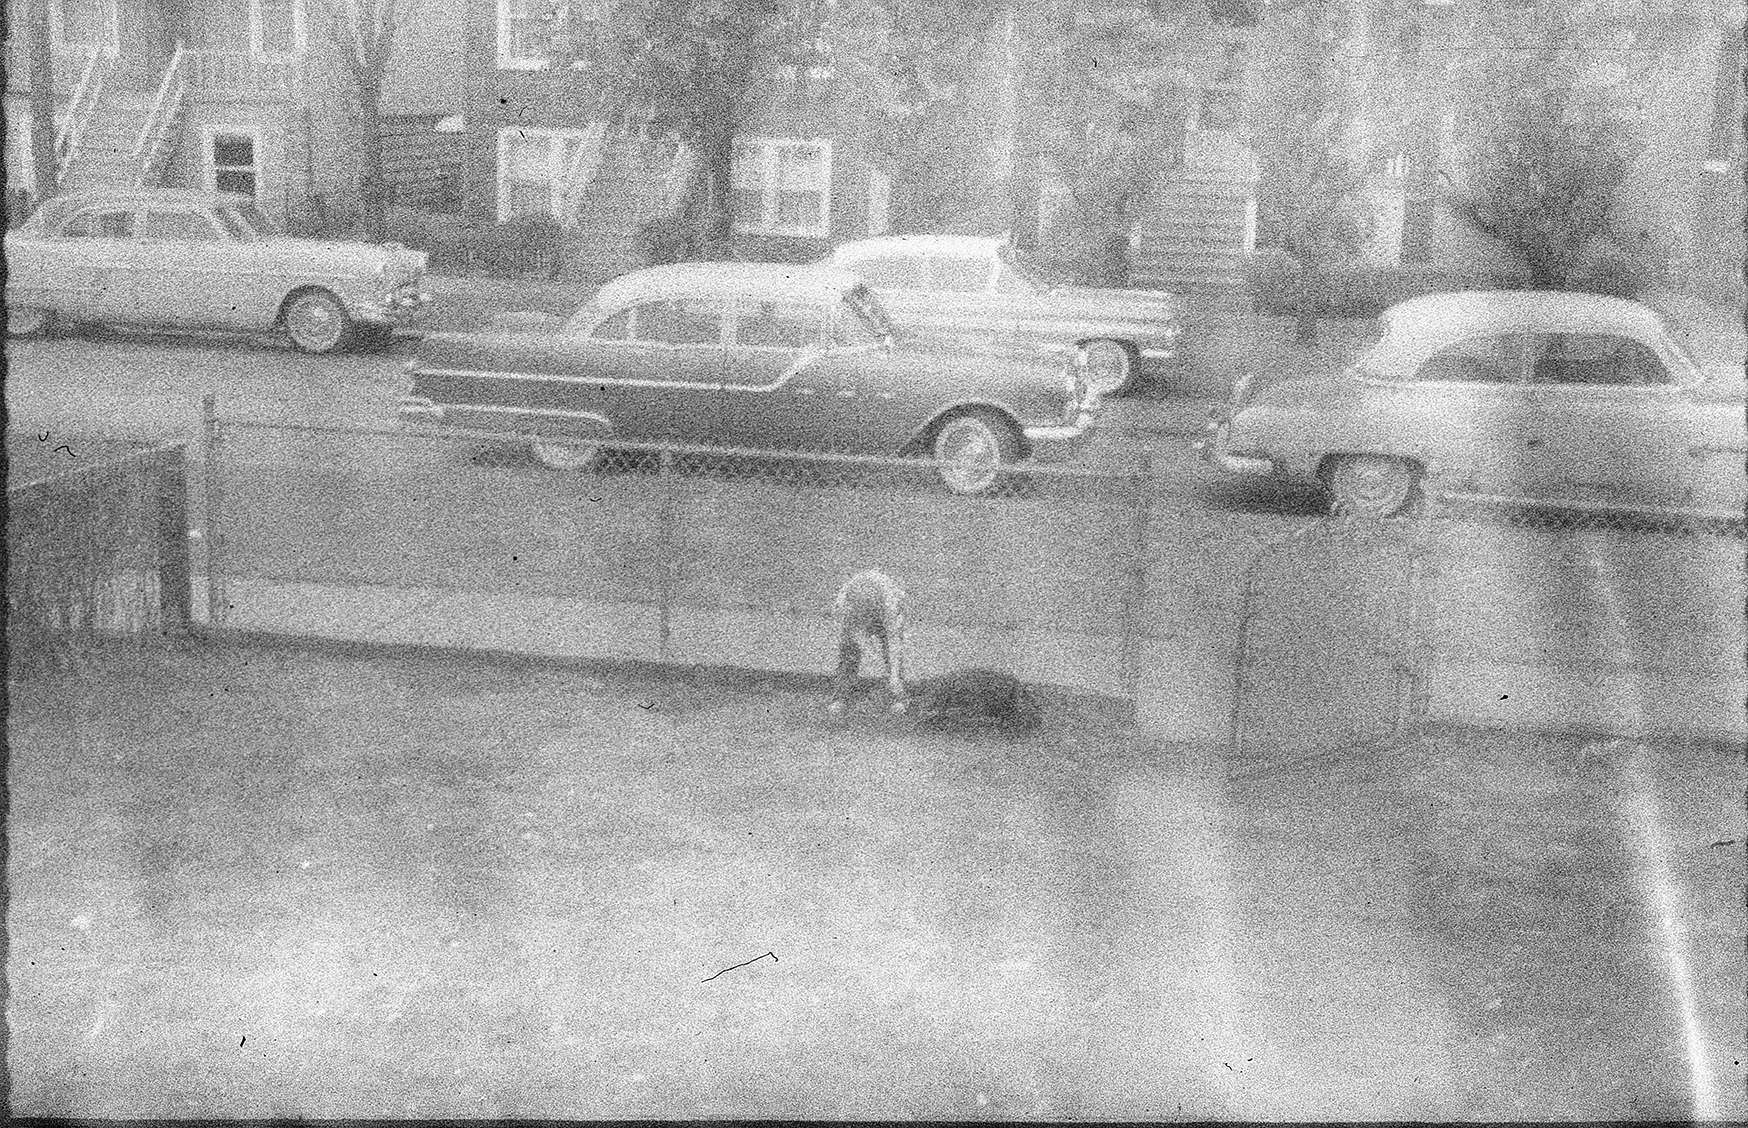 Paul Bundle 66 Roll 5 025.jpg